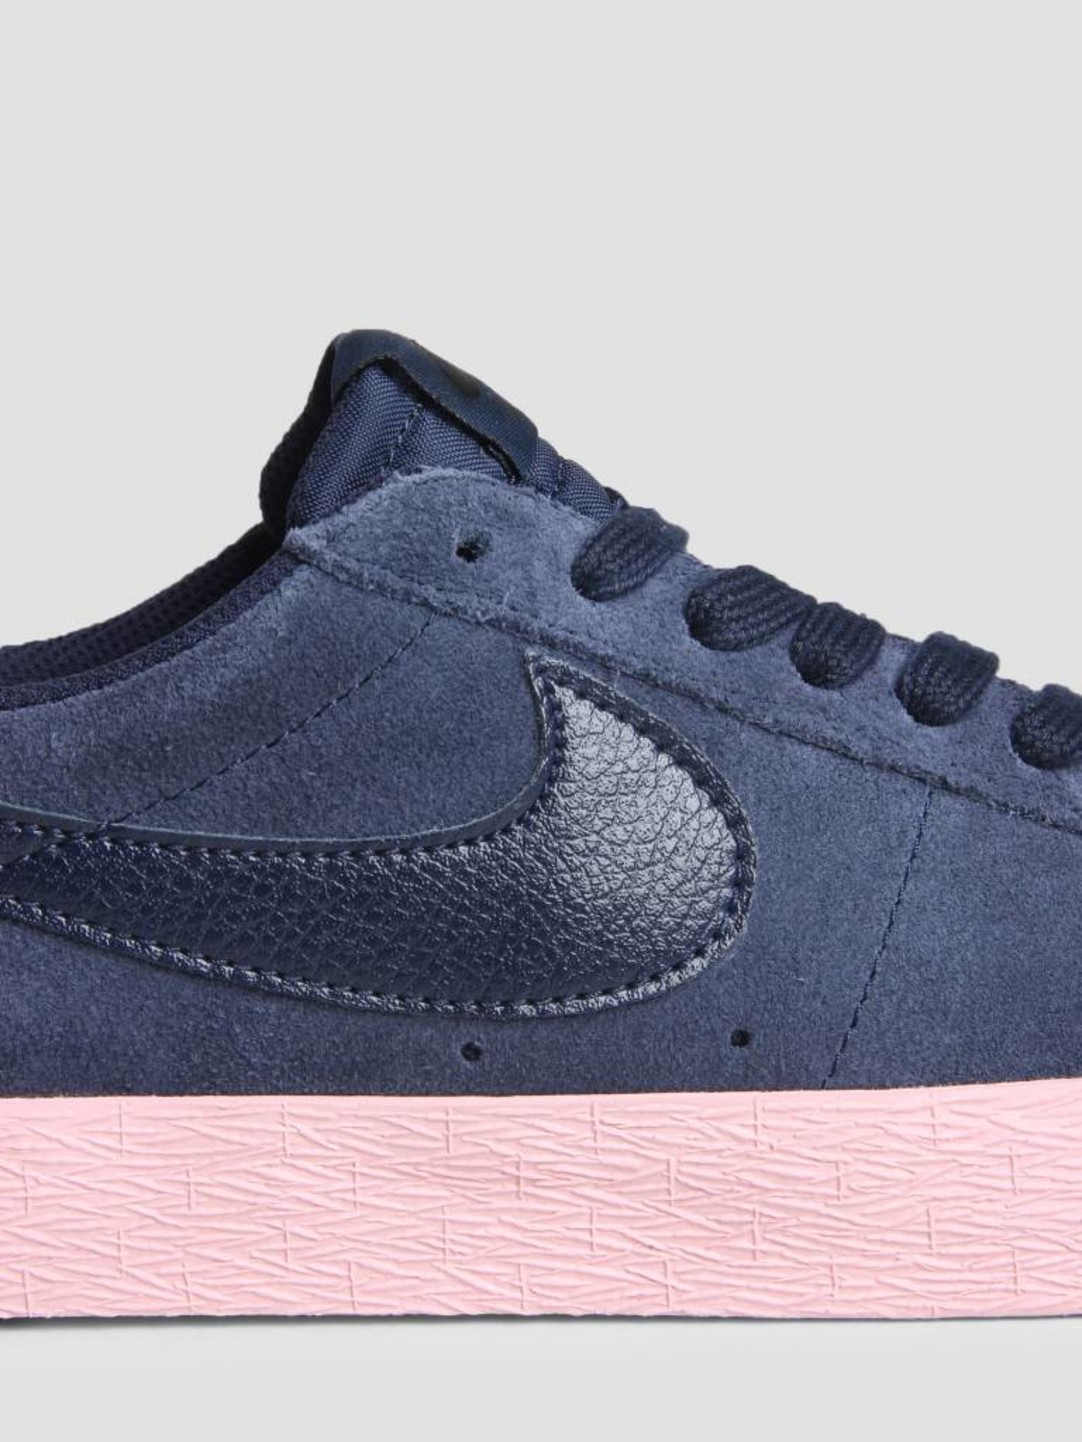 Nike Nike SB Zoom Blazer Low Obsidian Obsidian Bubblegum 864347-402